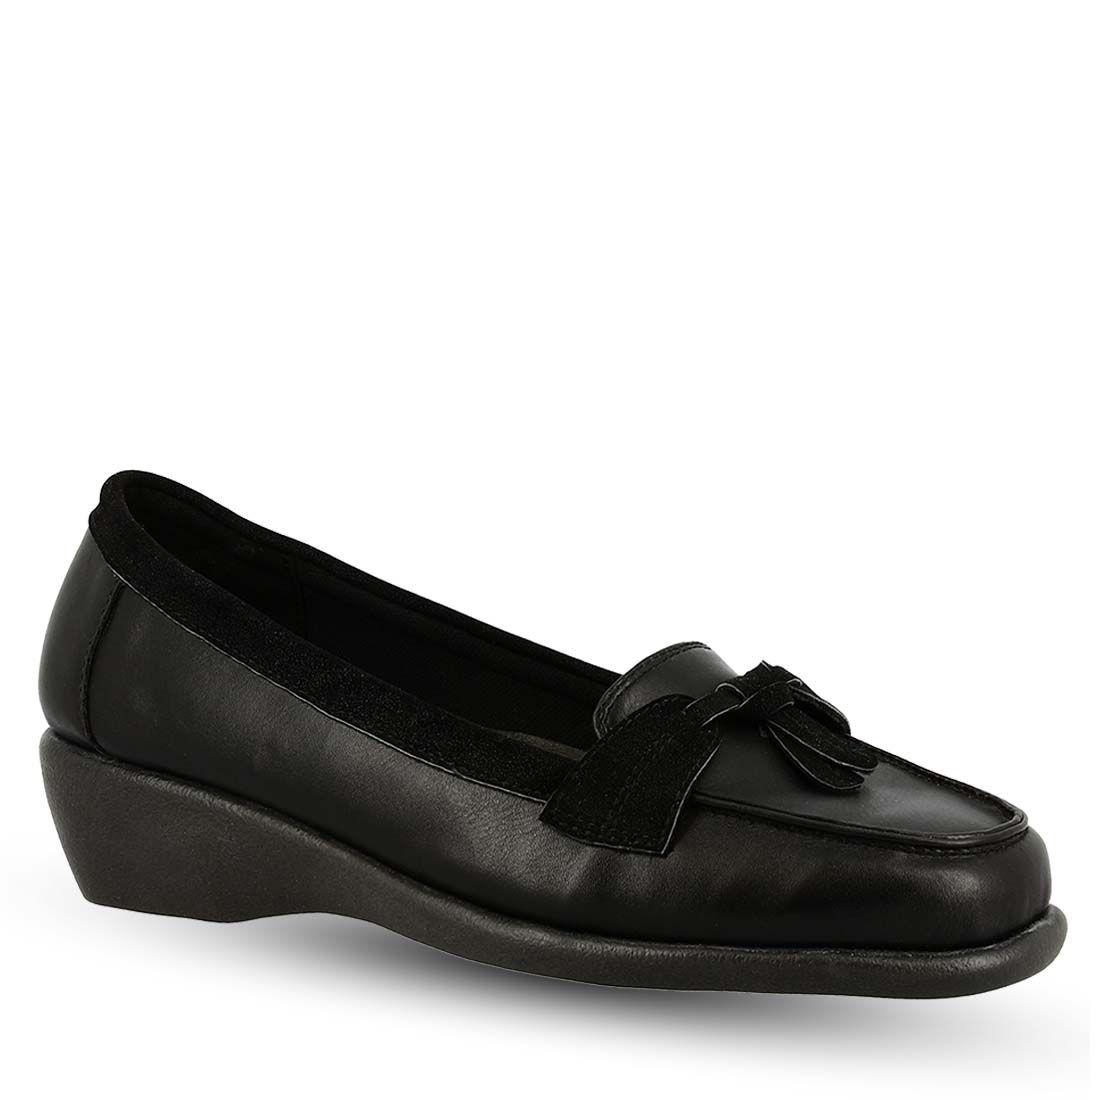 Parex Γυναικεία Παπούτσια Μοκασίνια 10520005.Β Μαύρο